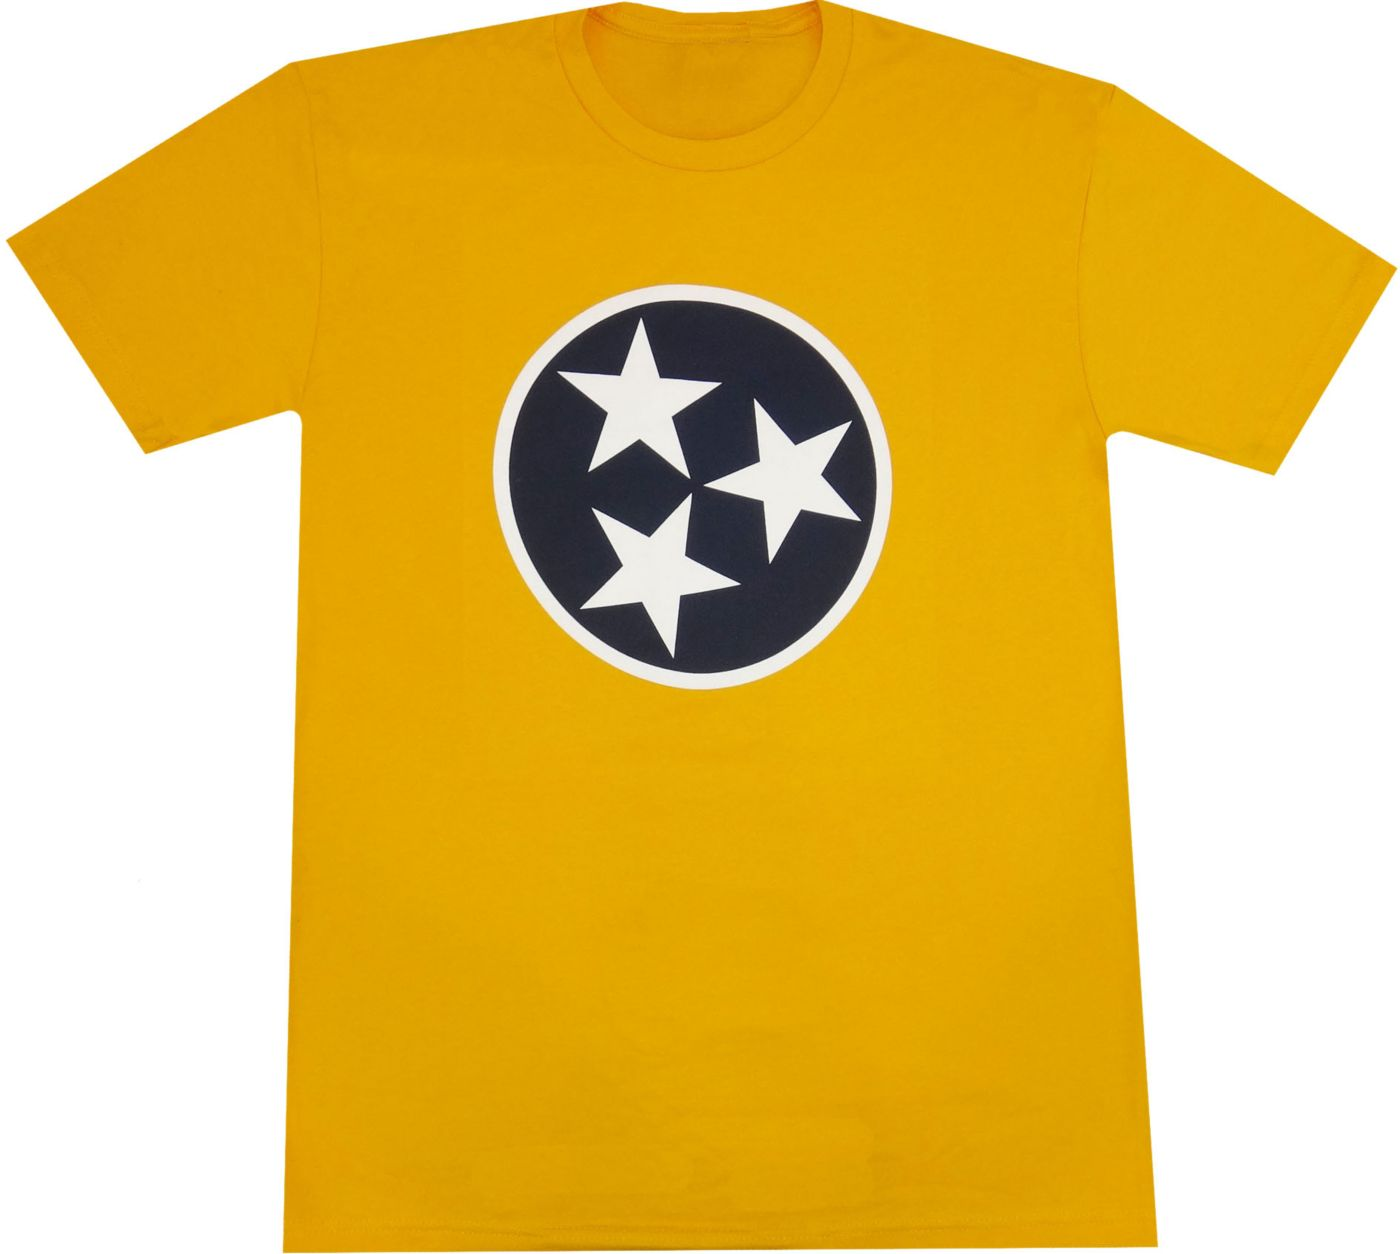 Aksels Men's Tennessee Stars T-Shirt